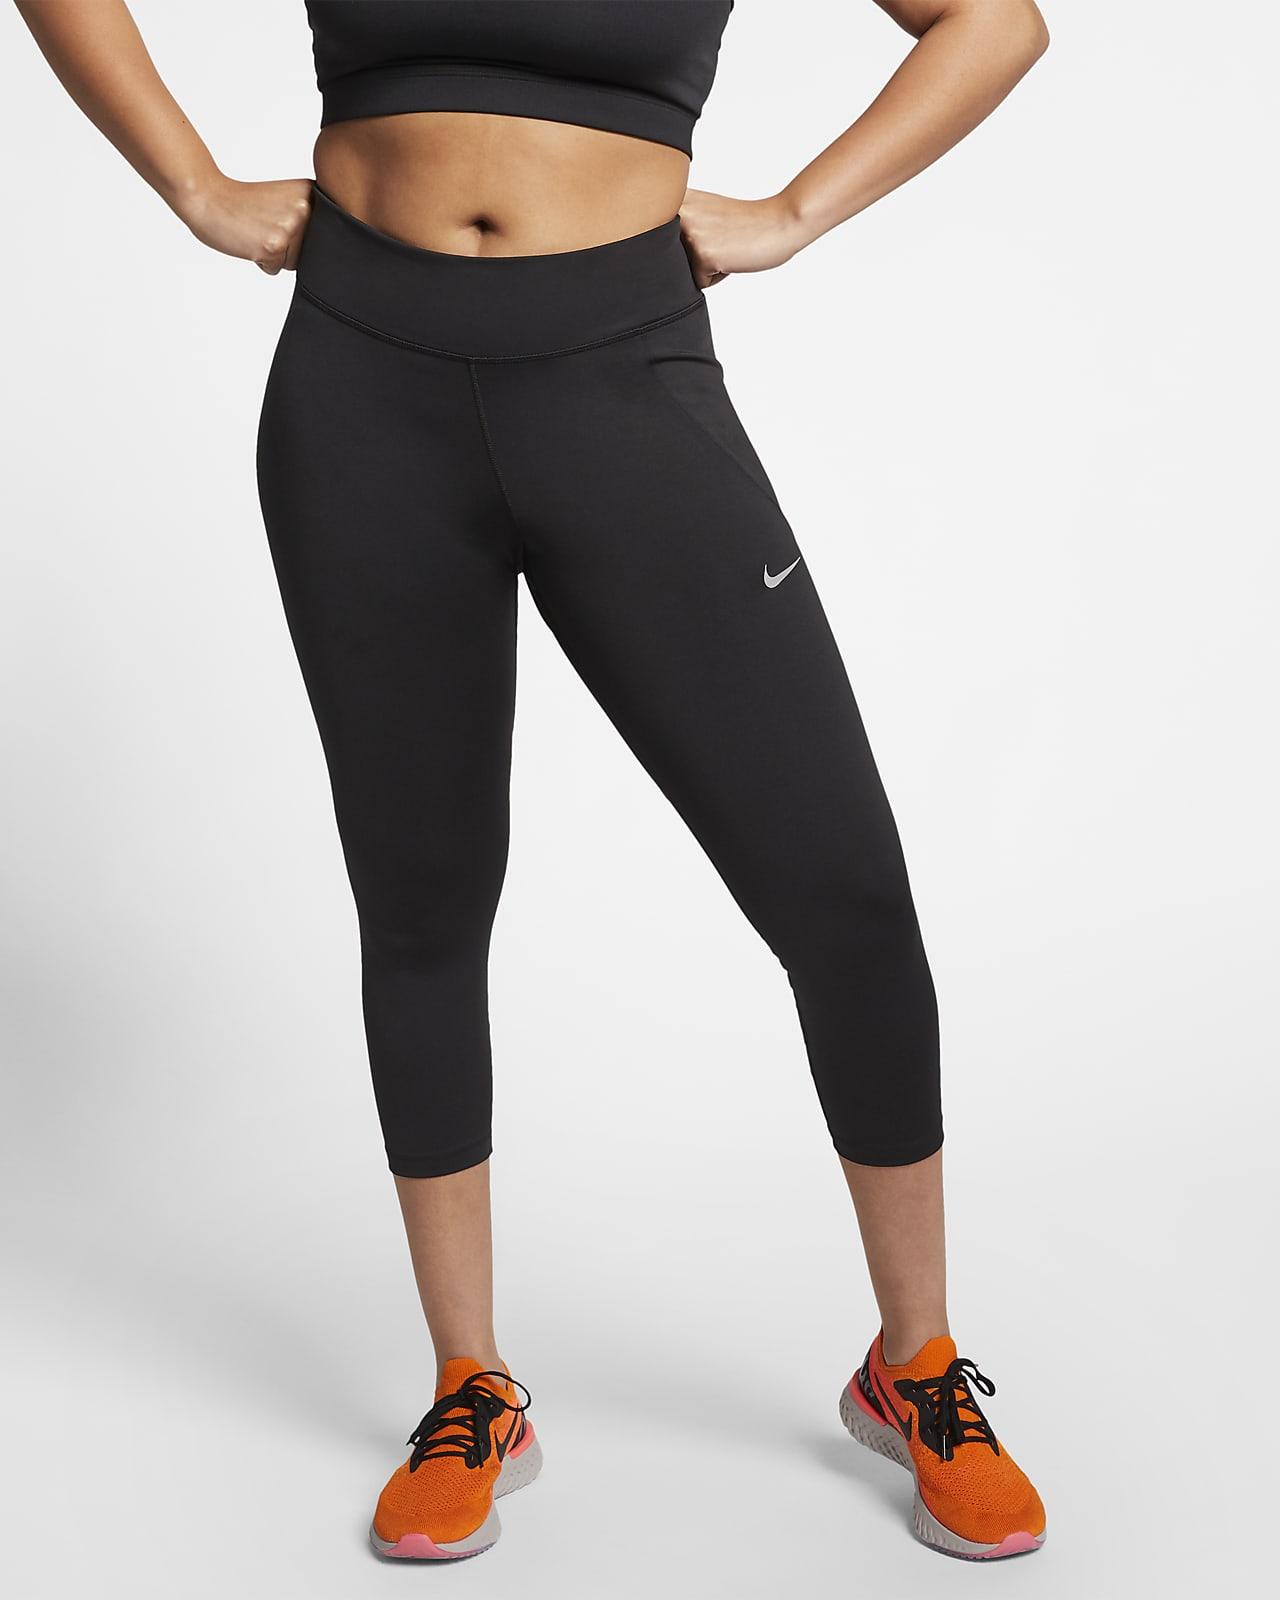 Nike Fast Mallas De Running Cortas Talla Grande Mujer Nike Es